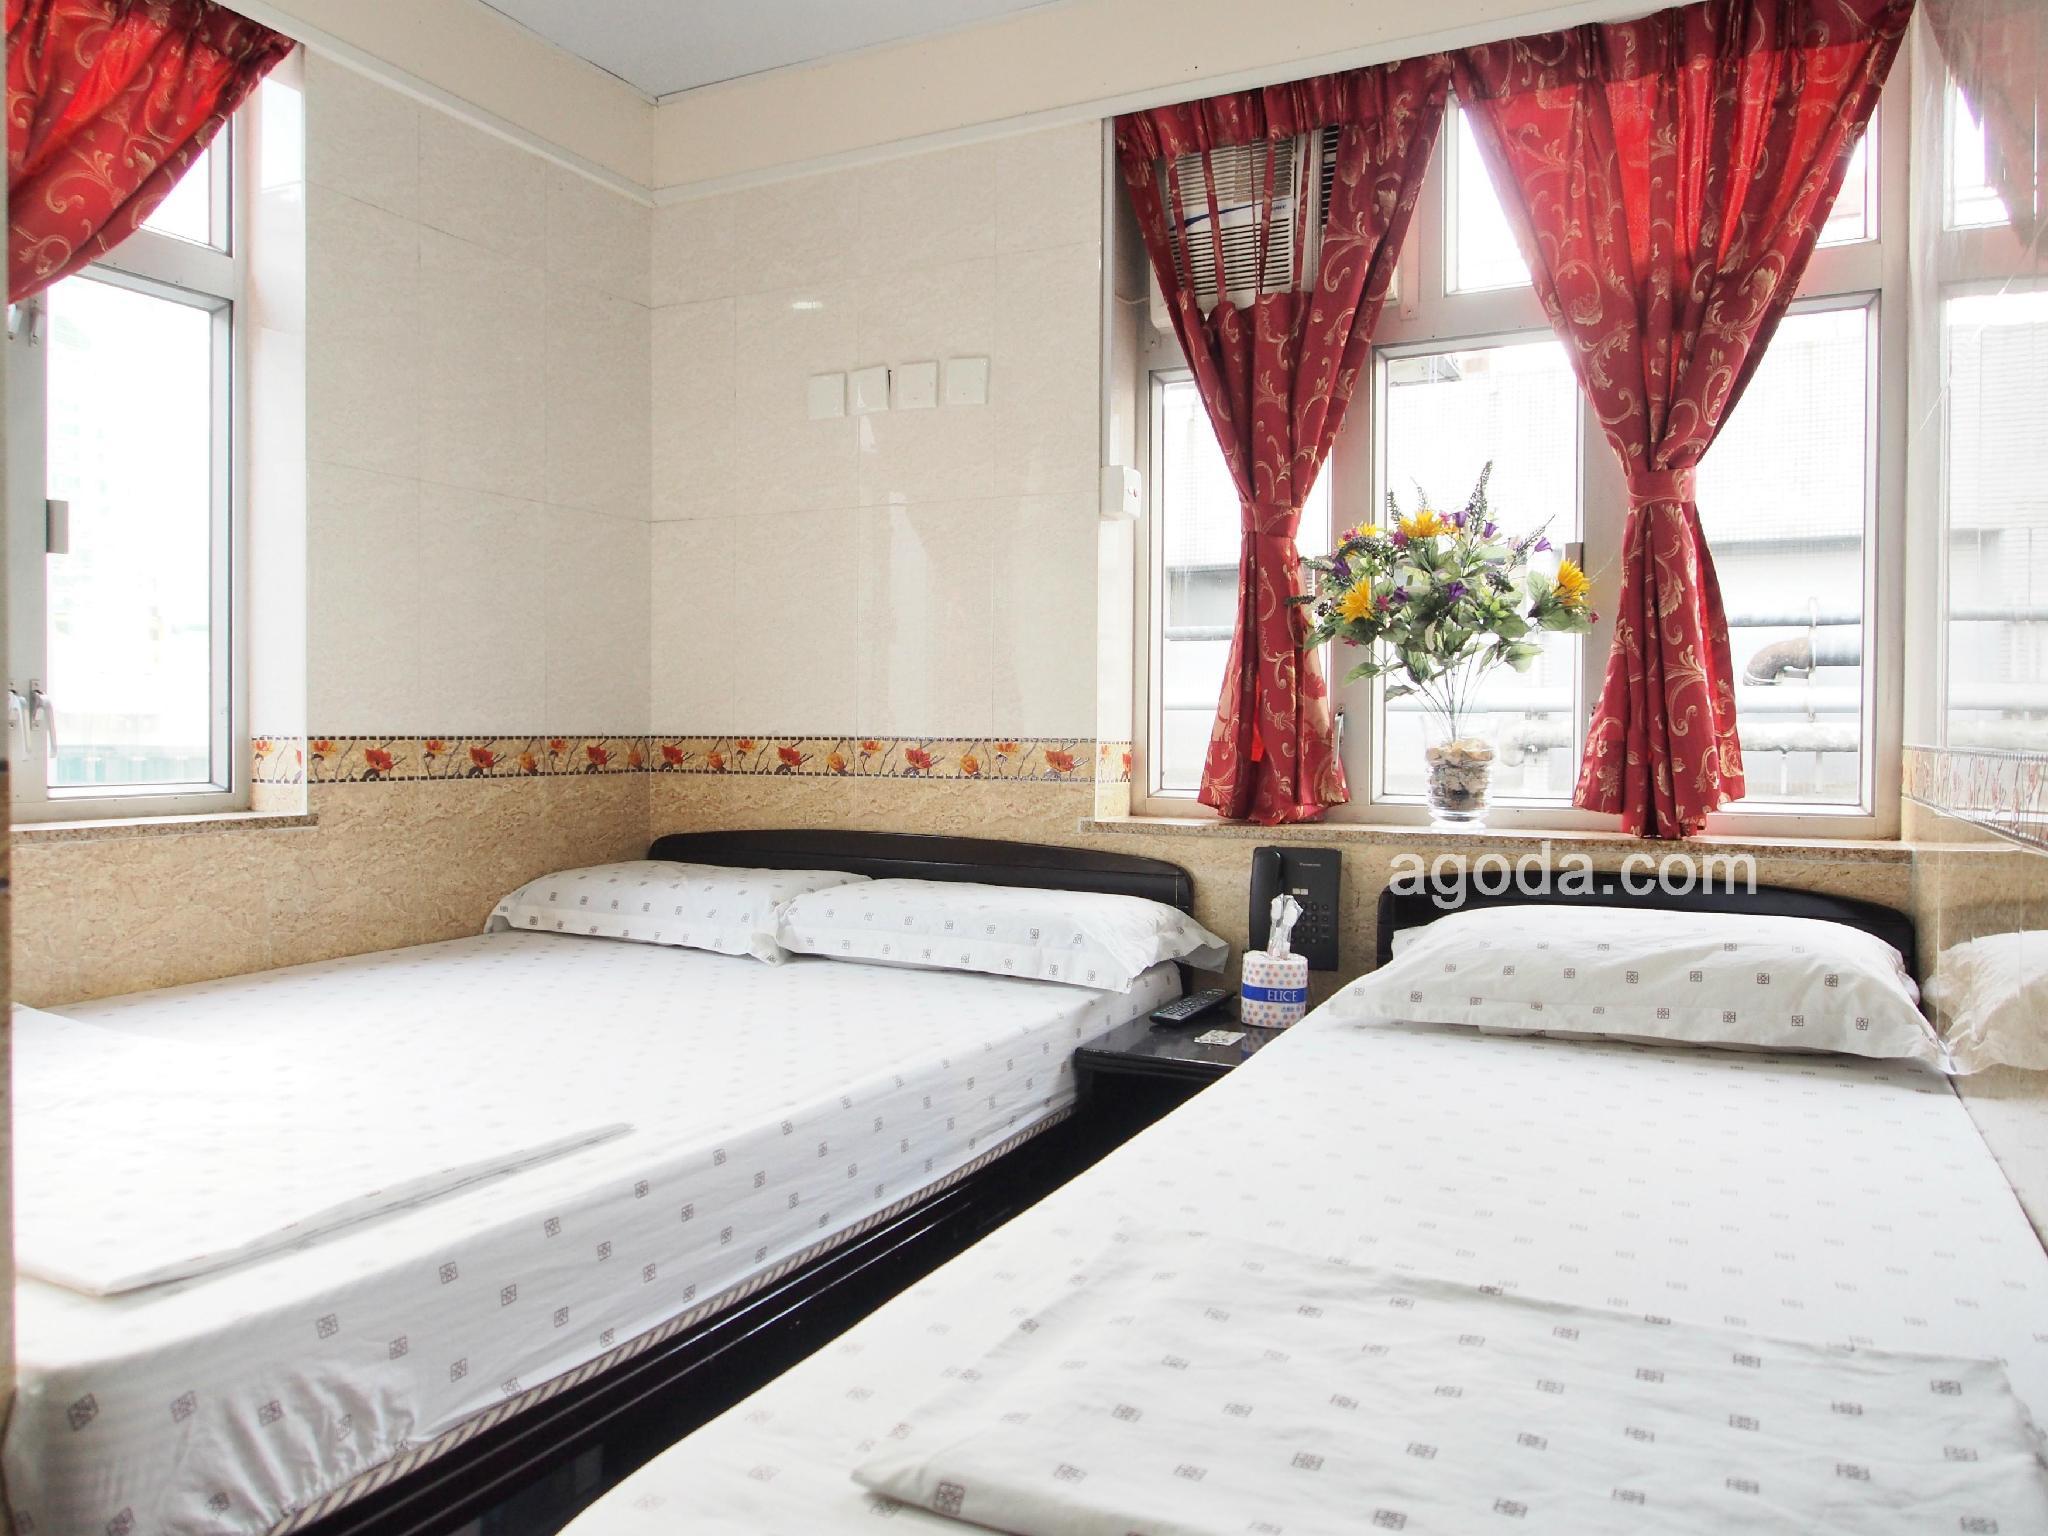 New London Hostel 4